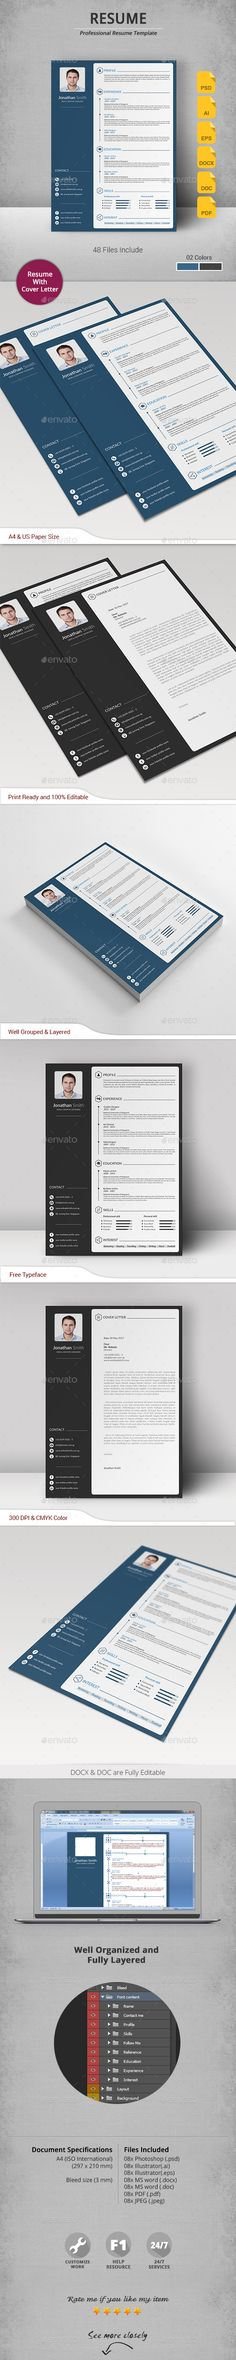 Resume Template PSD, Vector EPS, AI, DOC & DOCX